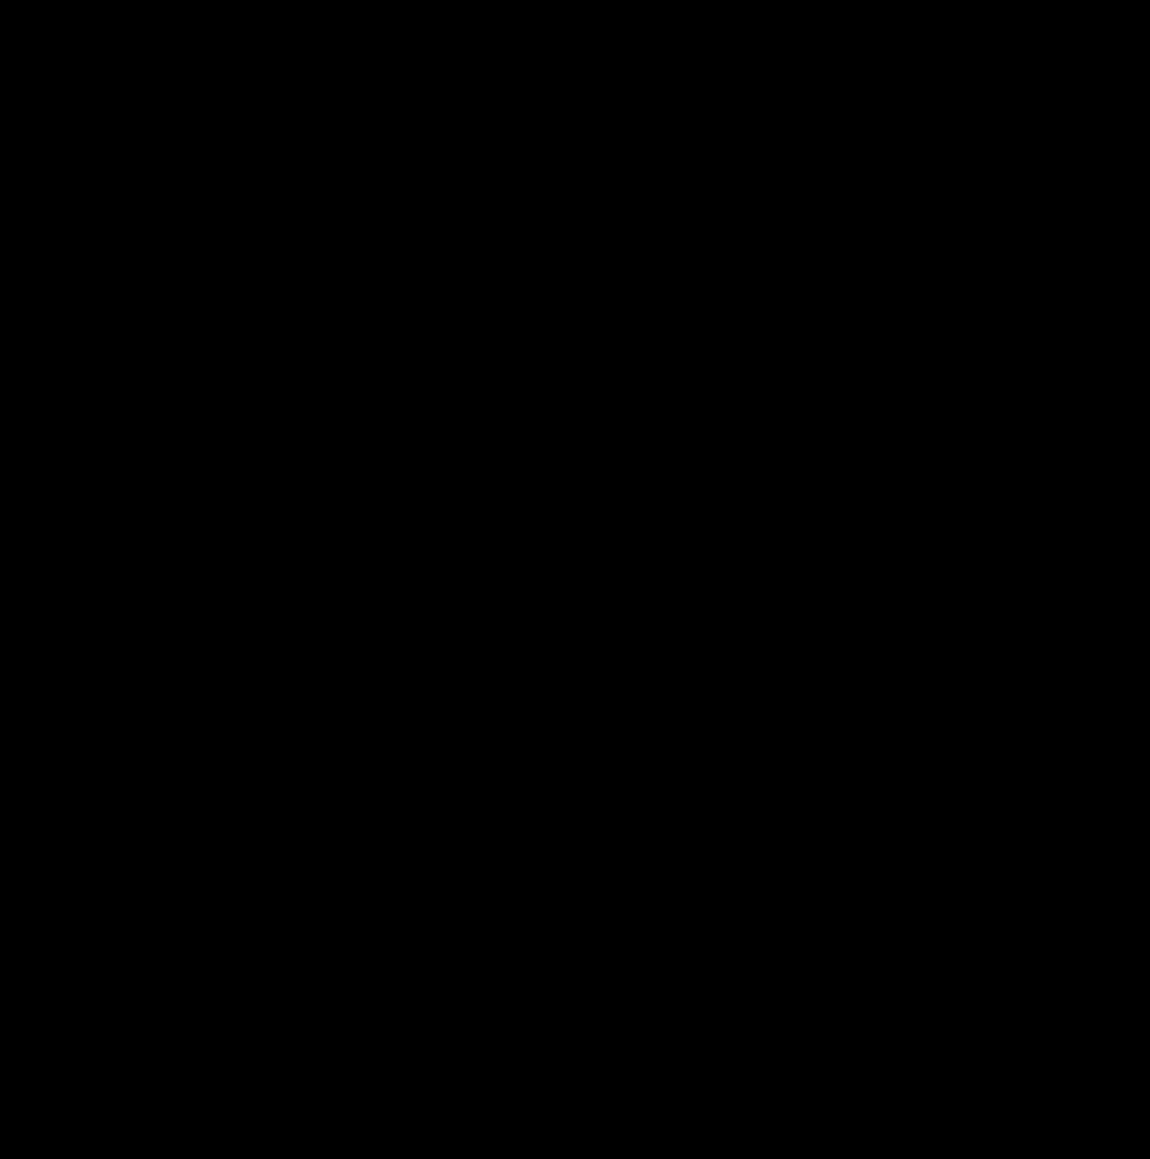 arma larga_silueta_vectorized